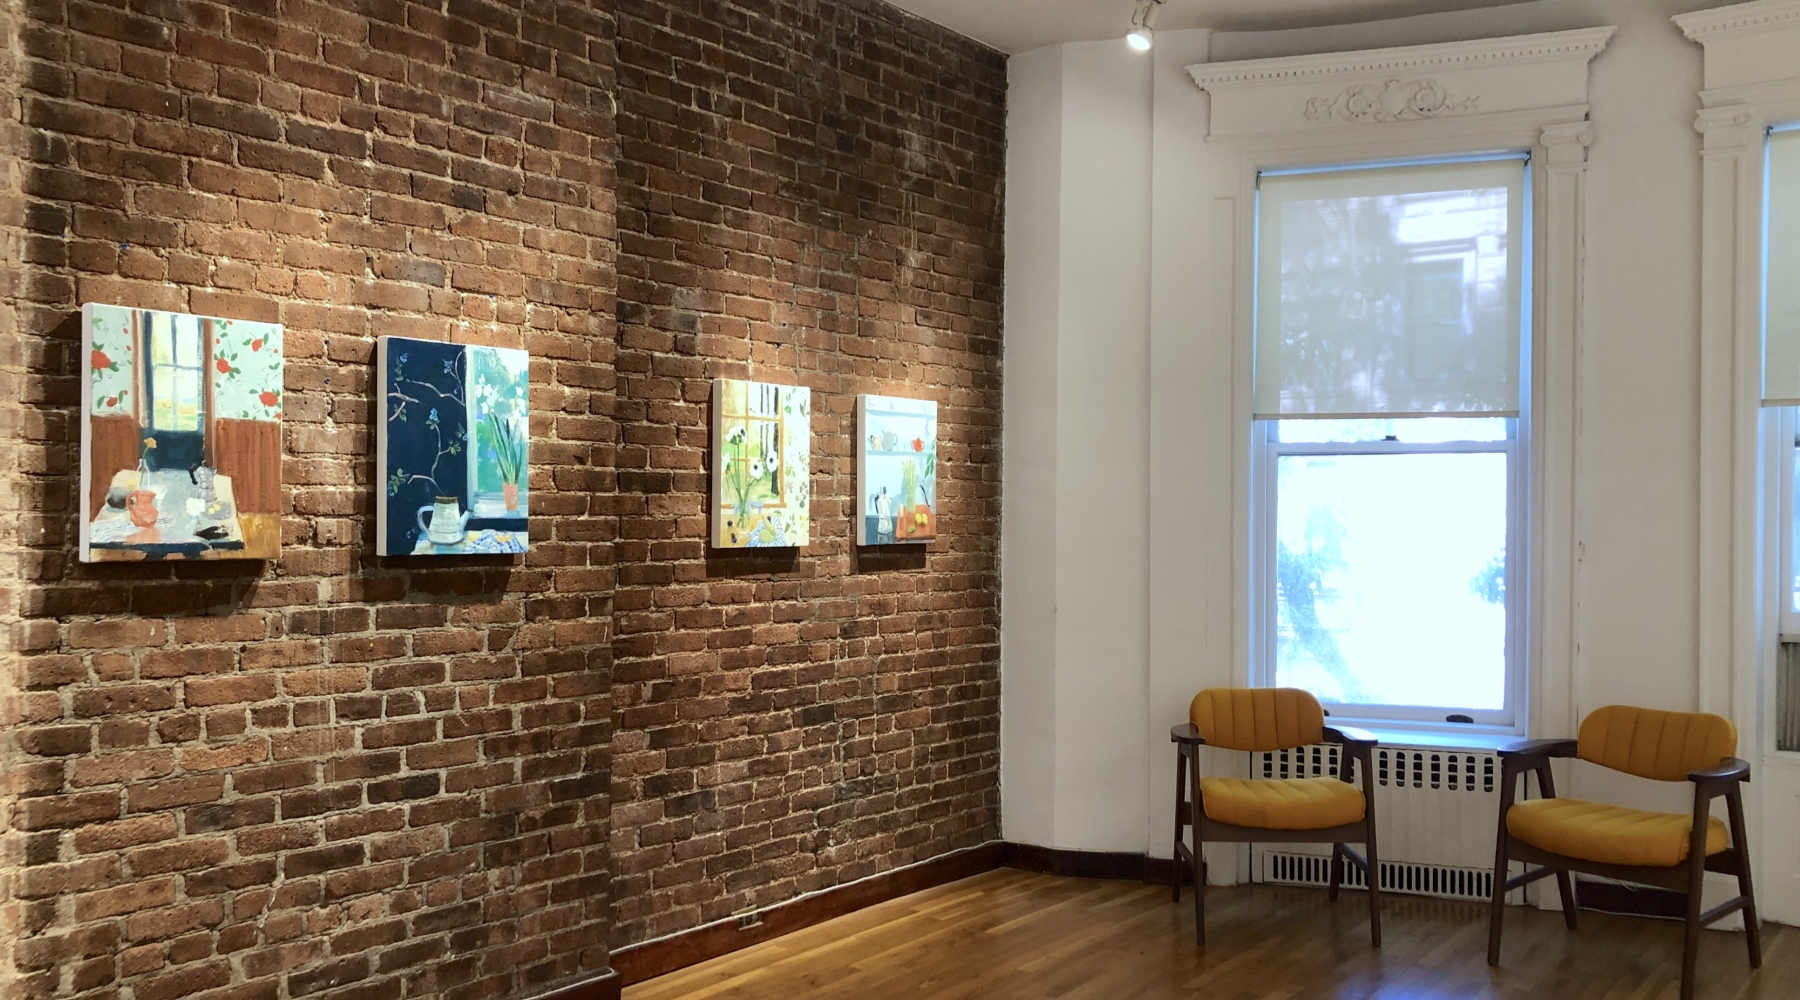 Melanie Parke: Inhabit September 9 - October 21, 2021 @ Susan Eley Fine Art, 46 W 90th, NYC